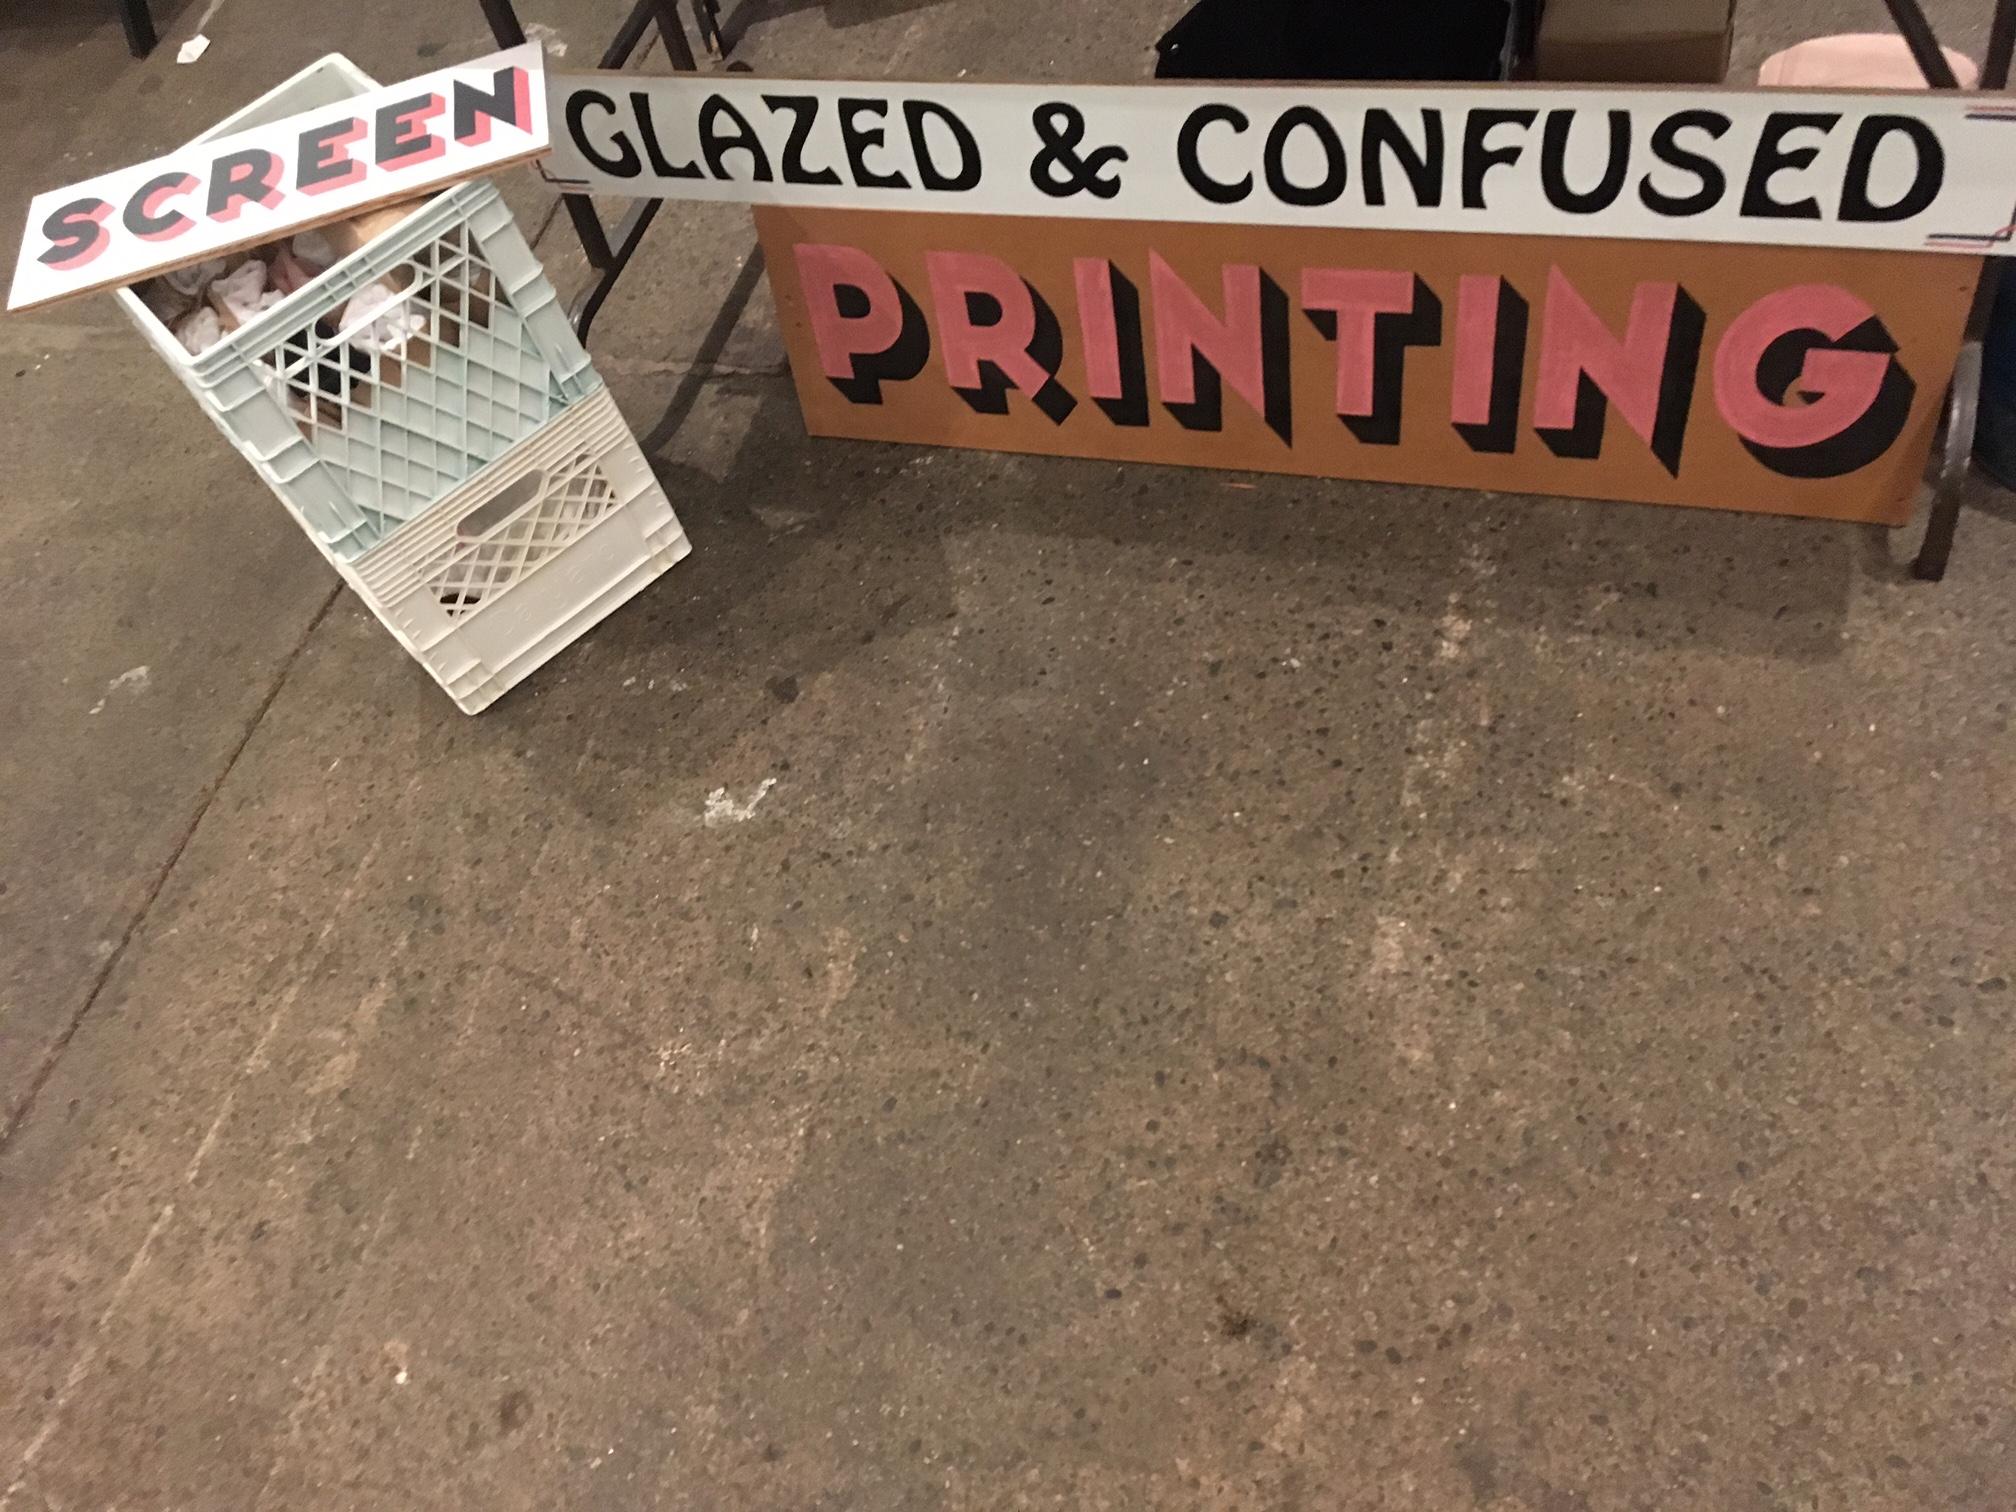 Glazed & confused market signage- not forsale